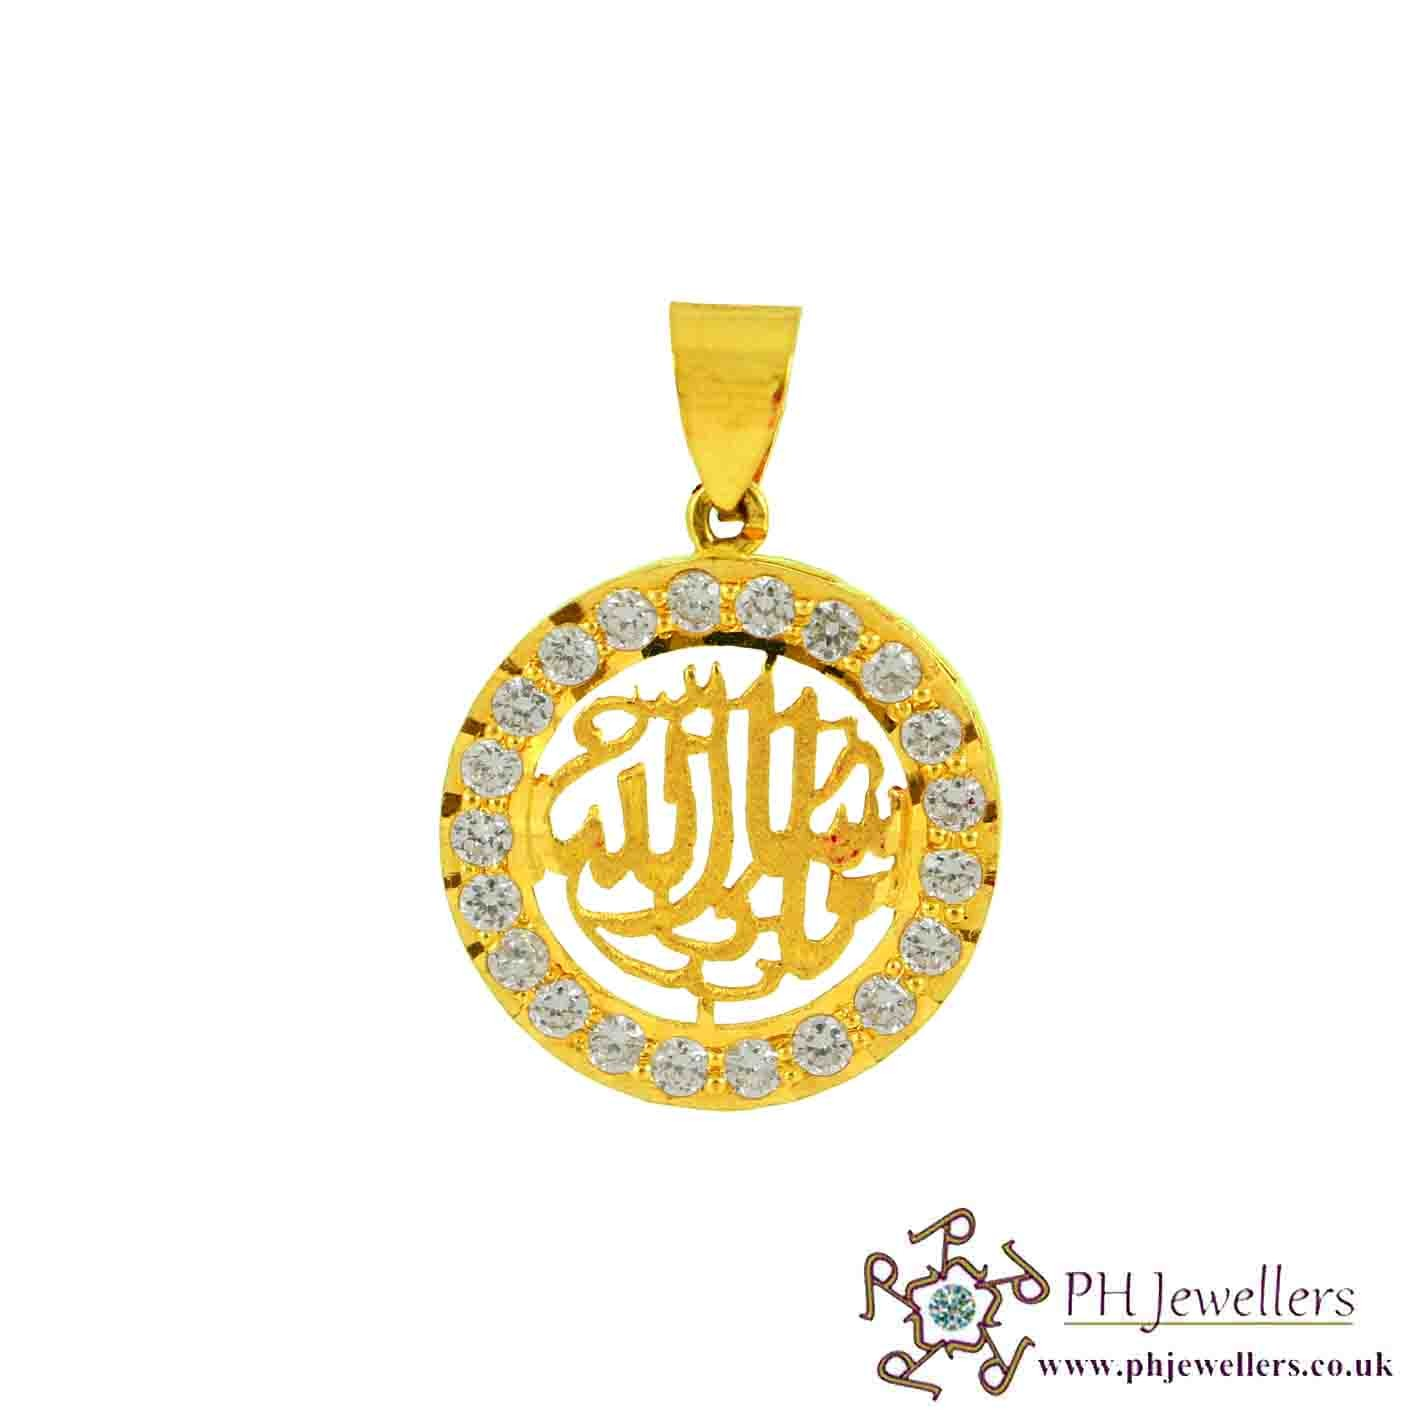 Online gold jewellery gold jewellery 22ct 916 hallmark yellow gold online gold jewellery gold jewellery 22ct 916 hallmark yellow gold pendant allah in round cz fp16 22 carat gold jewellers aloadofball Gallery